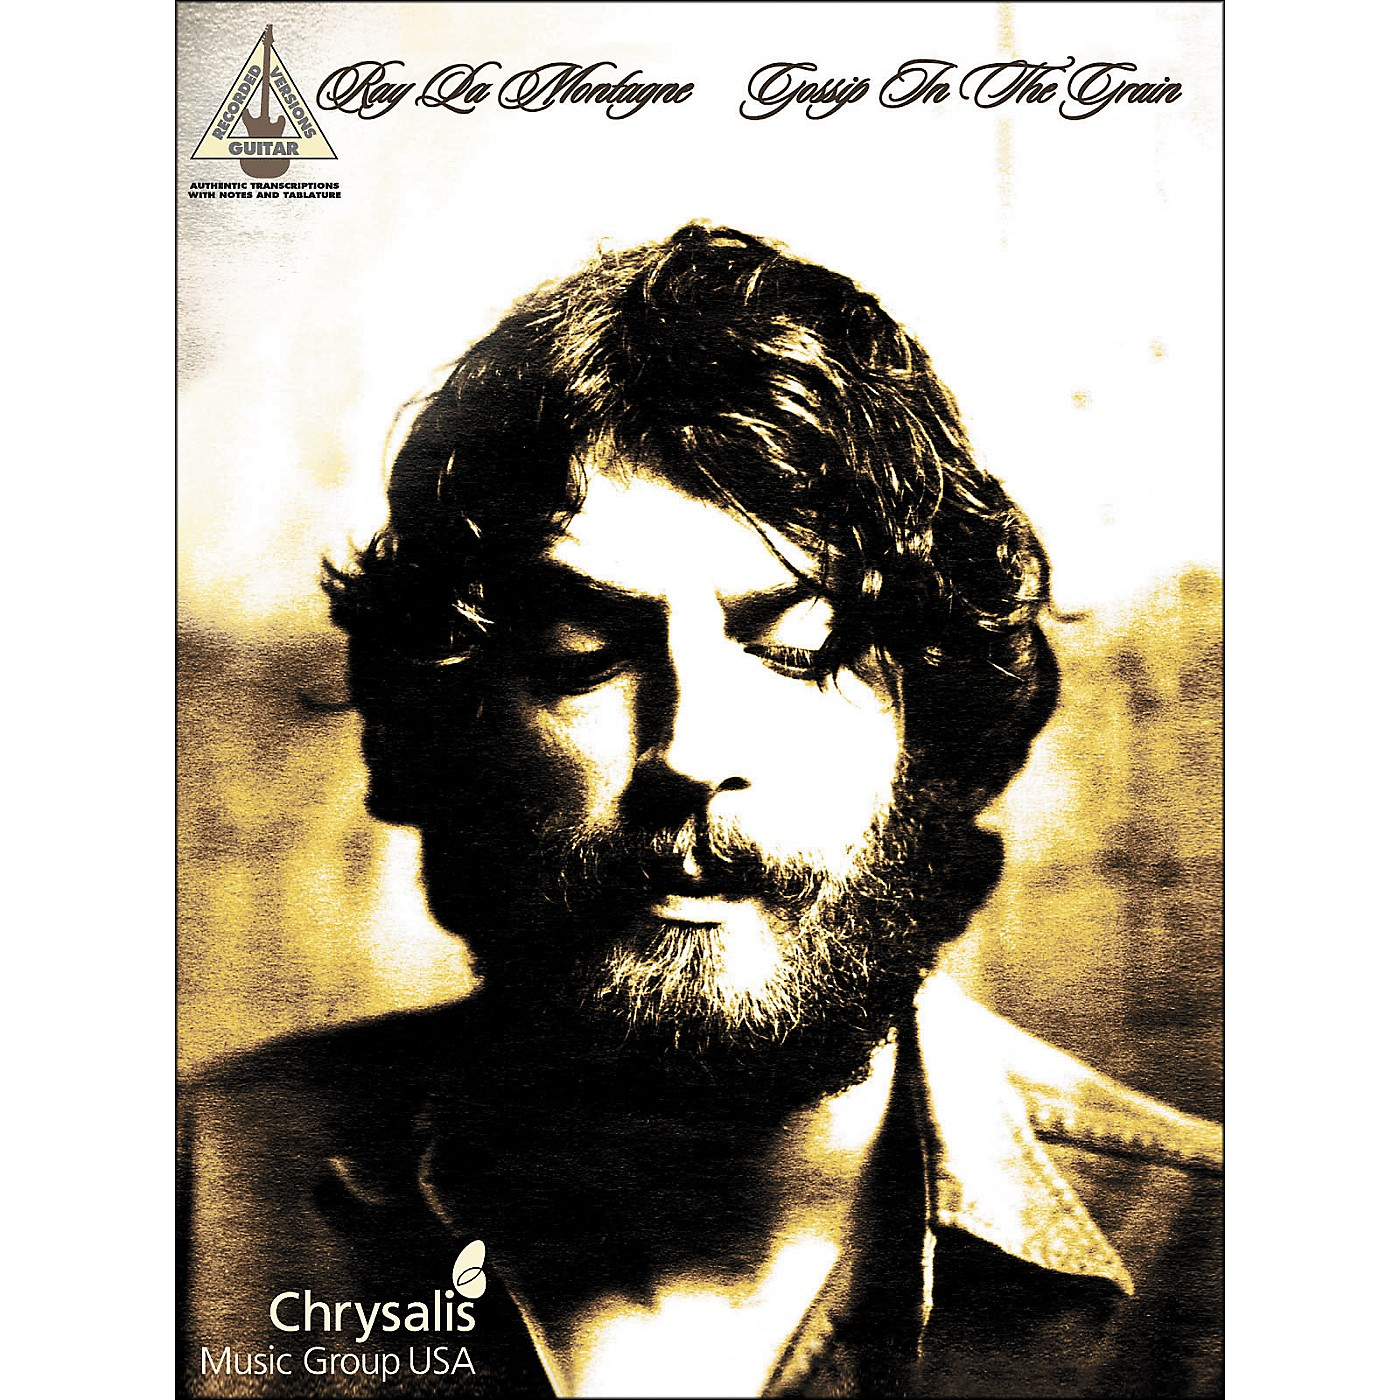 Hal Leonard Ray Lamontagne - Gossip In The Grain Tab Book thumbnail